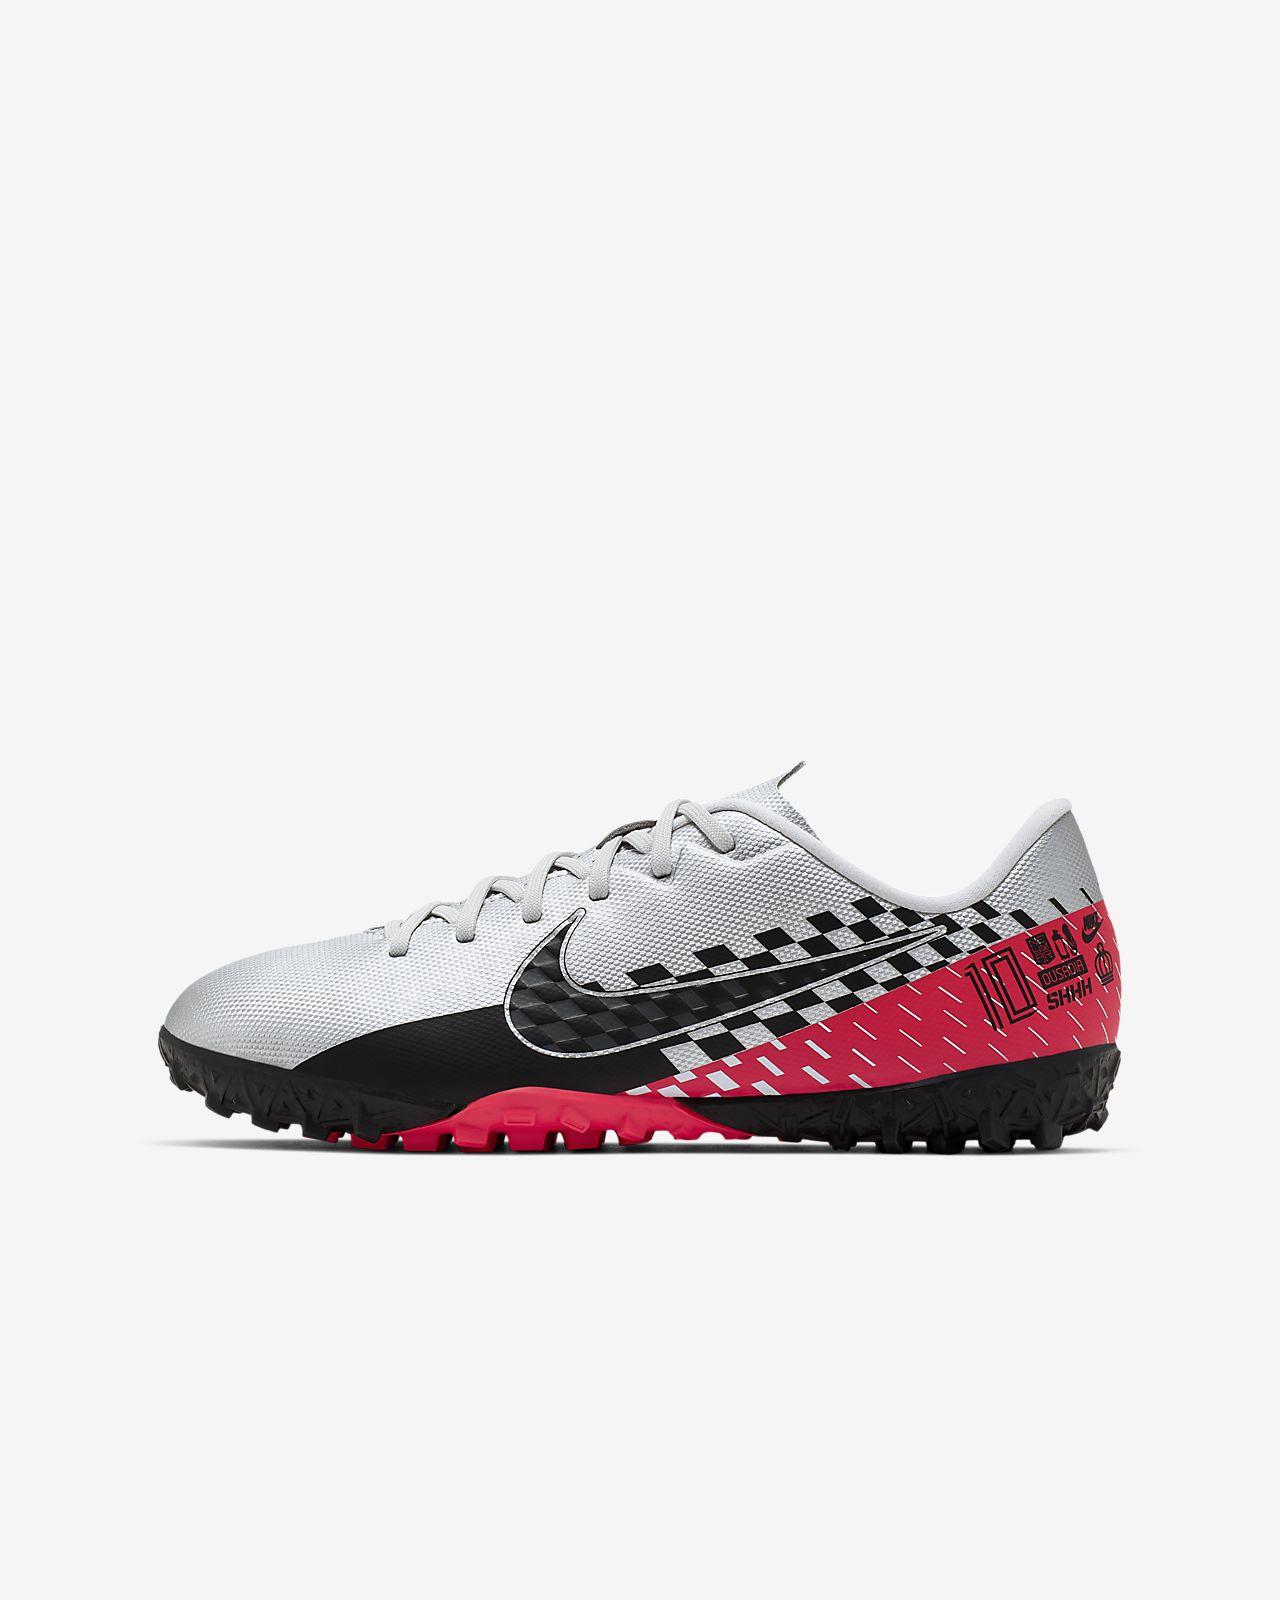 Nike Jr. Mercurial Vapor 13 Academy Neymar Jr. TF Little/Big Kids' Artificial-Turf Soccer Shoe